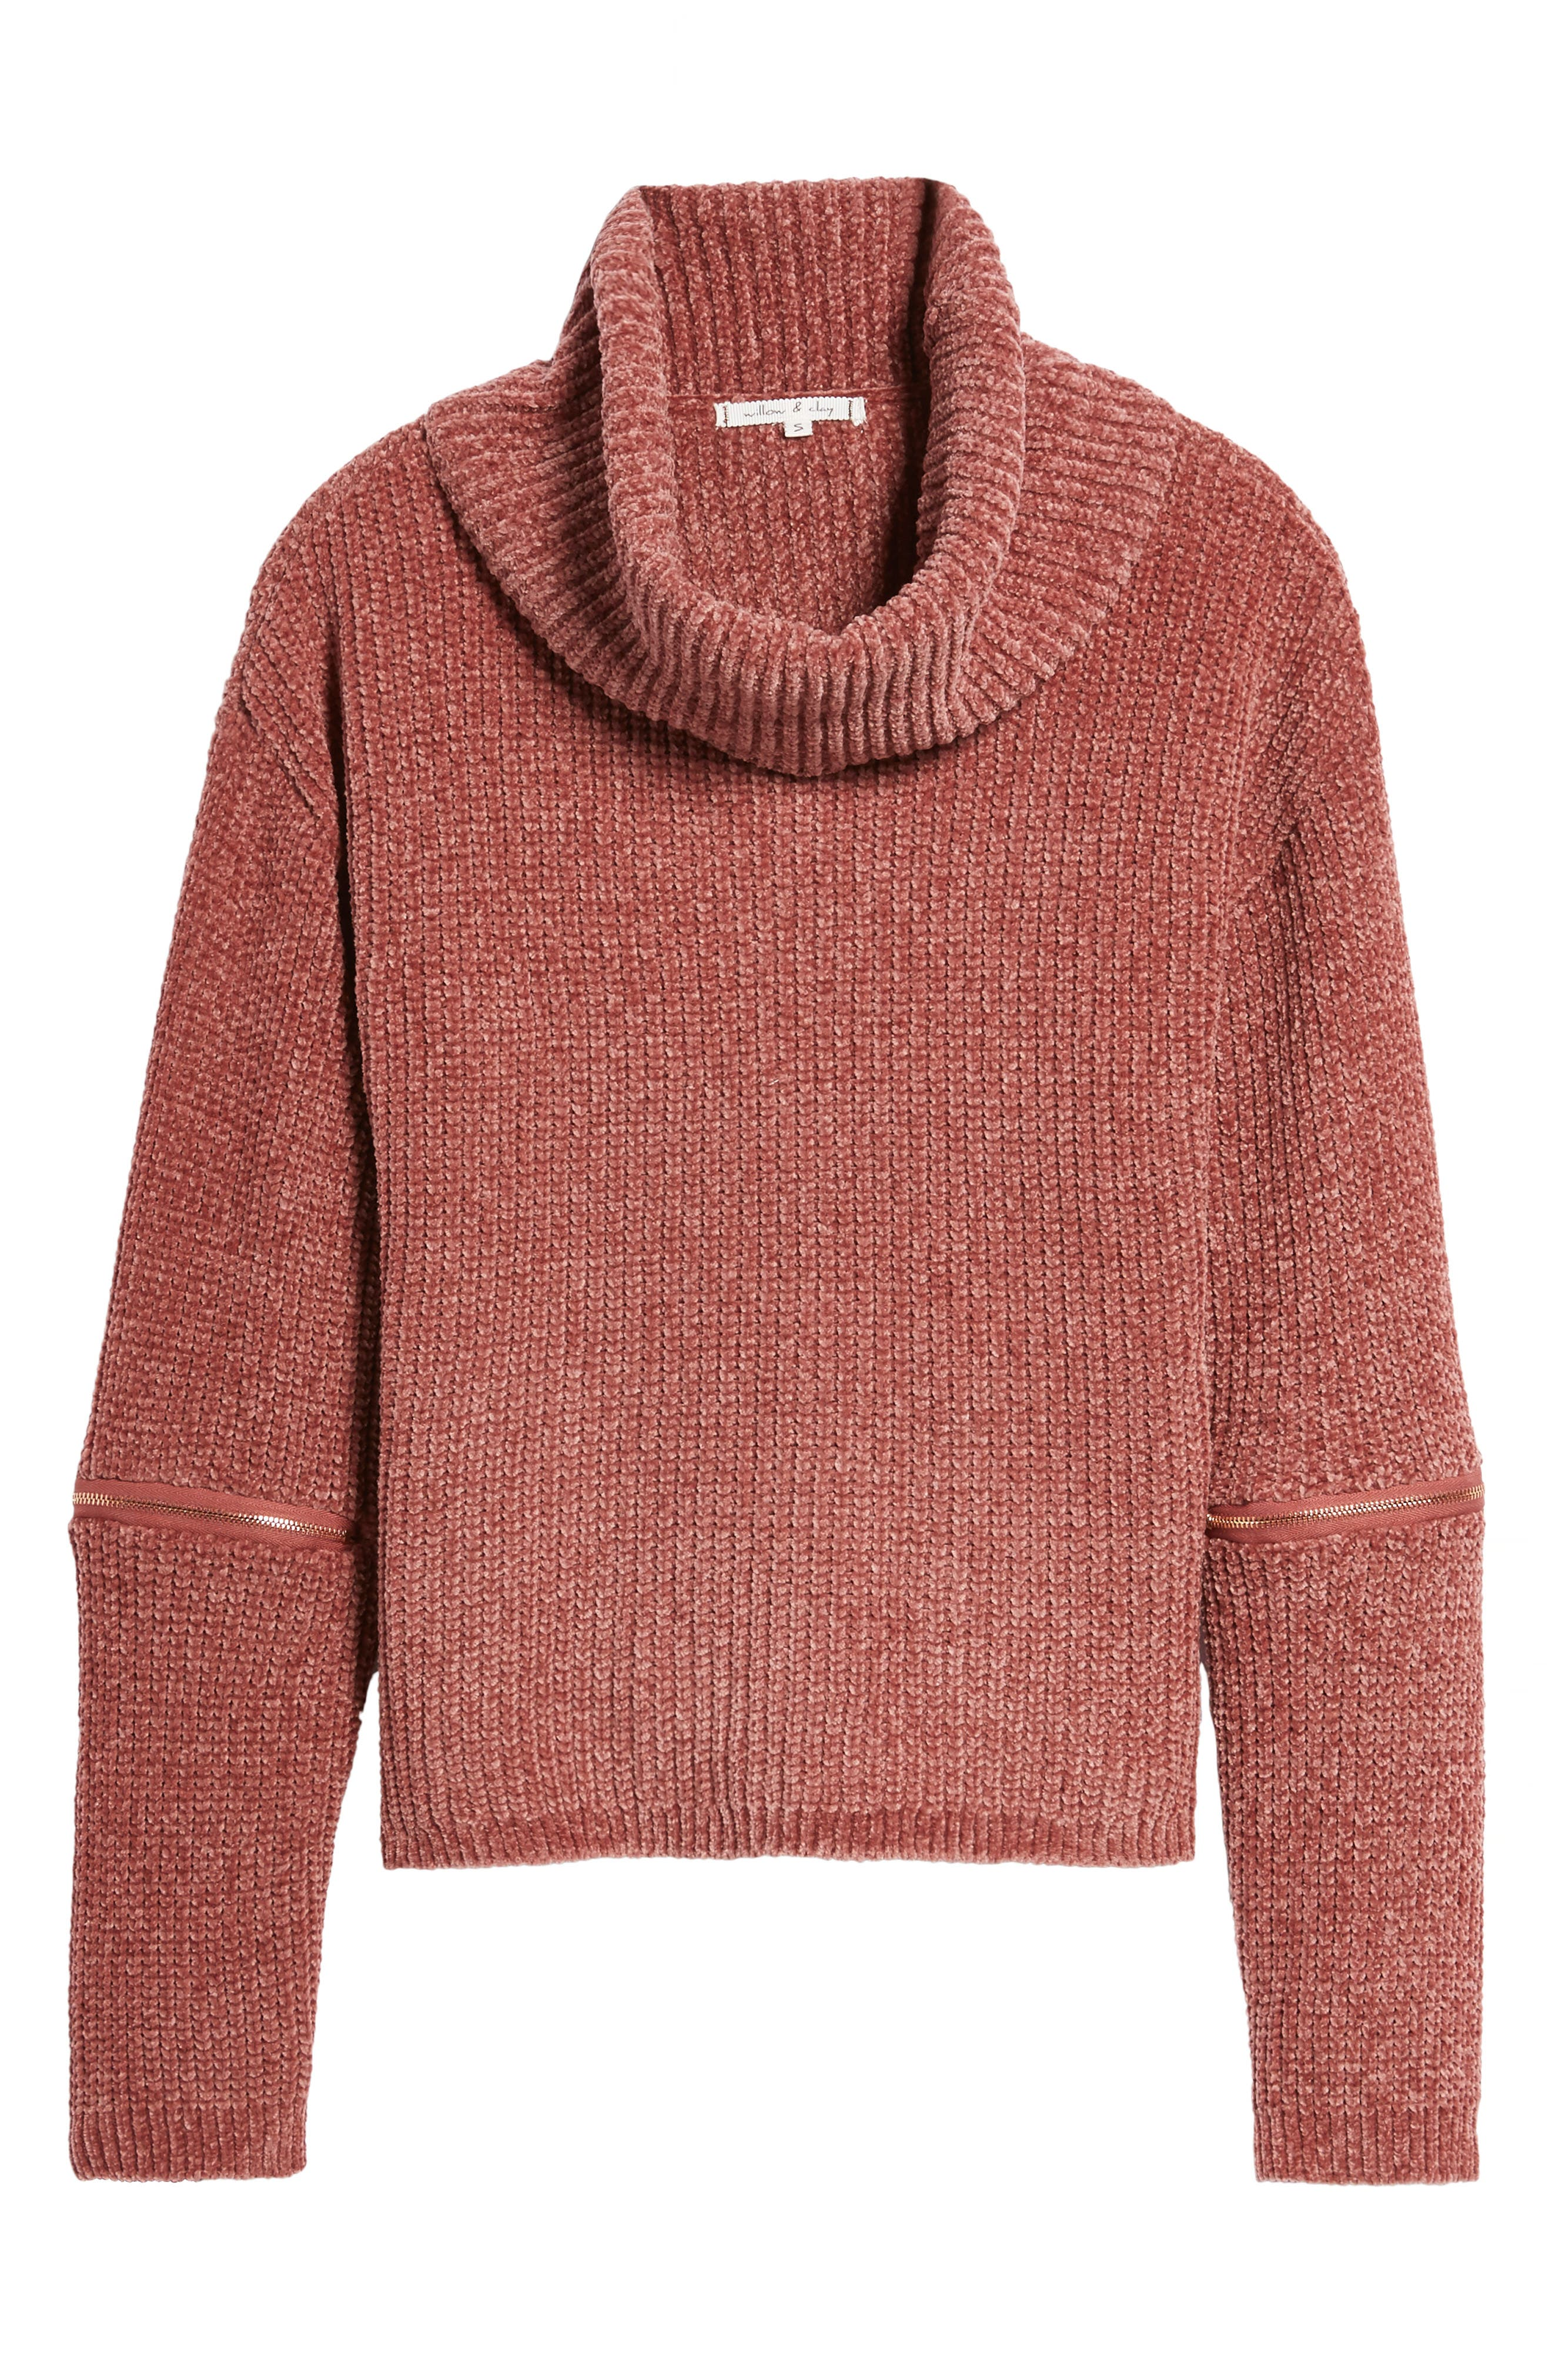 Zip Sleeve Turtleneck Sweater,                             Alternate thumbnail 6, color,                             566